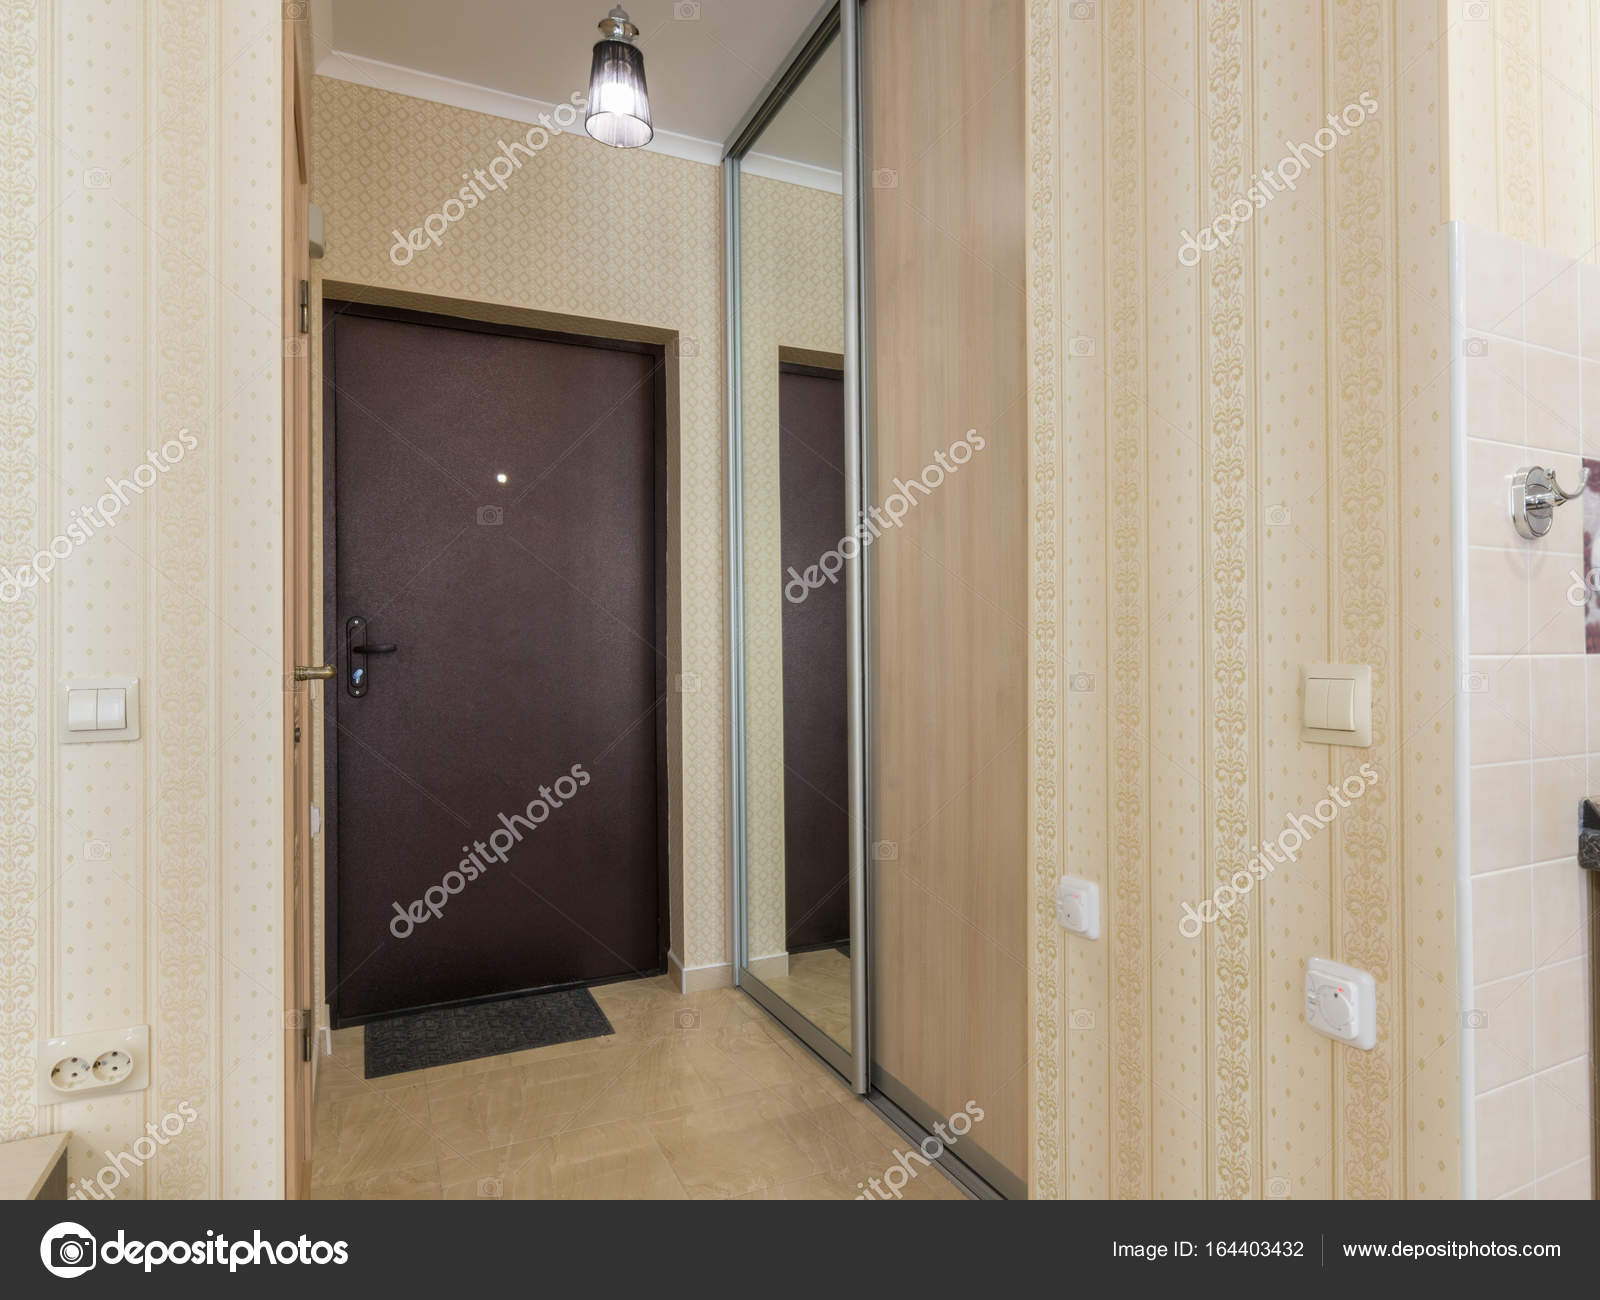 Corridoio d ingresso interni porta d ingresso e armadi u foto